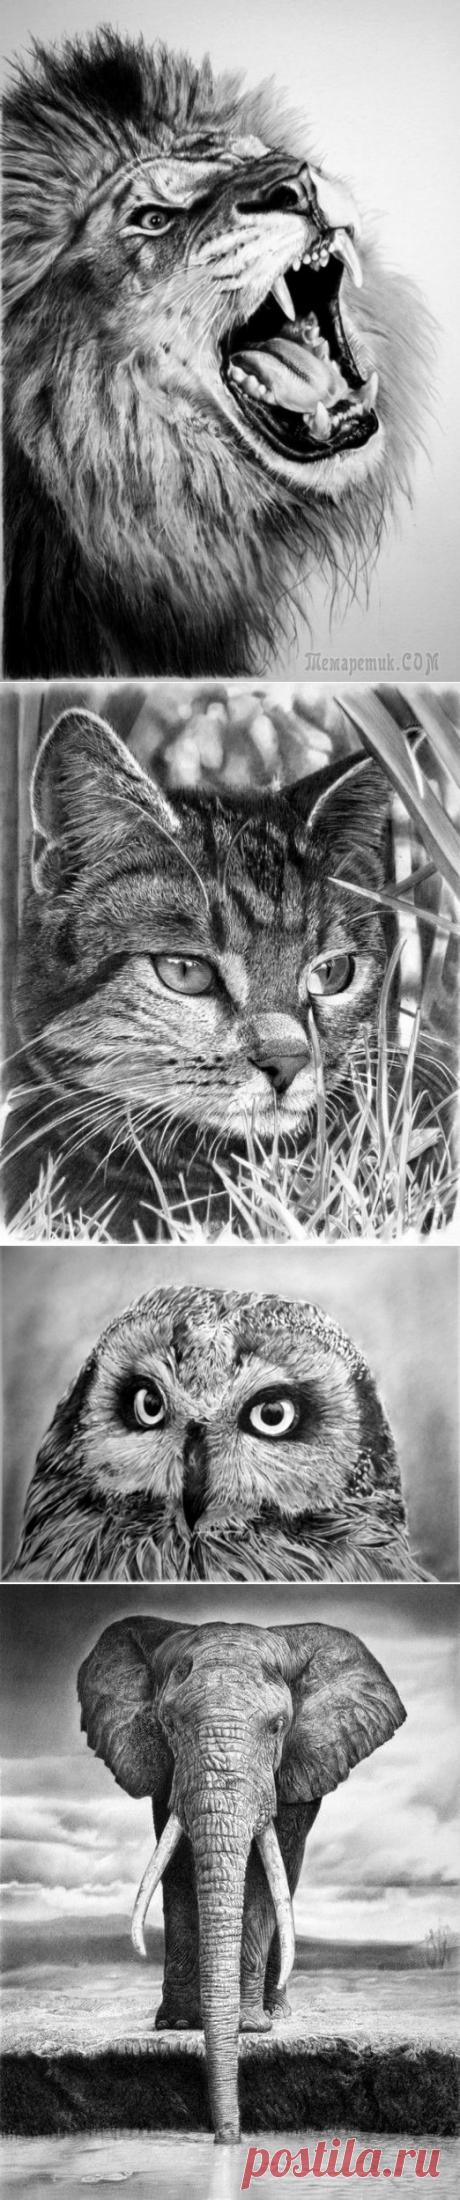 Франко Клун (Franco Clun) и его гиперреалистические рисунки карандашом.